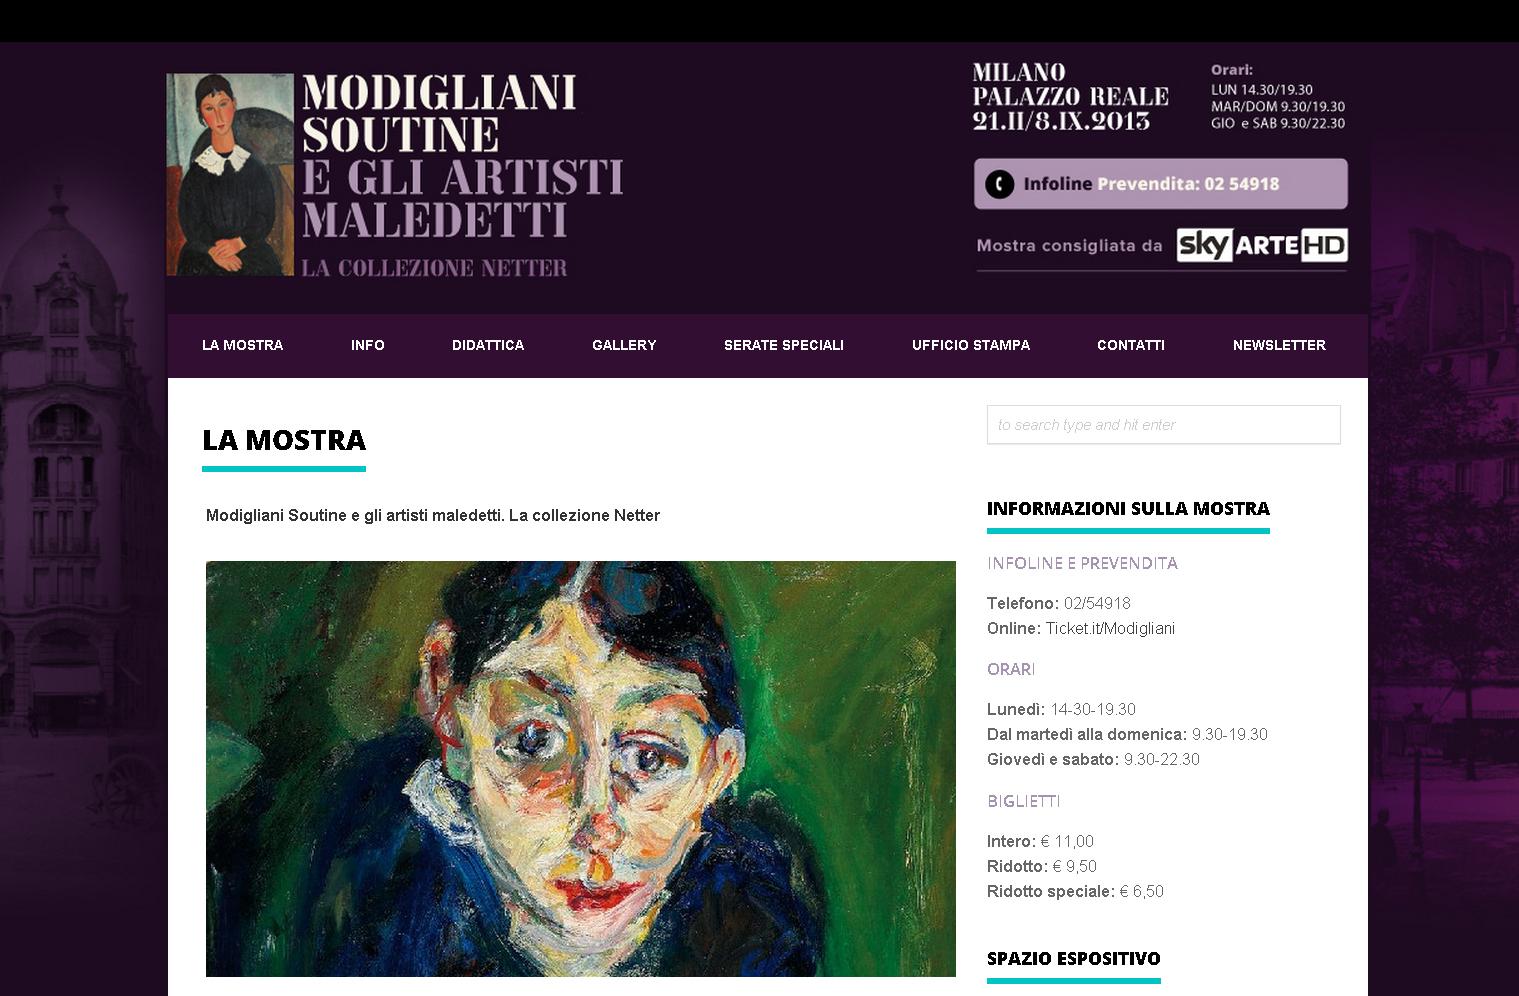 Modigliani-Soutine